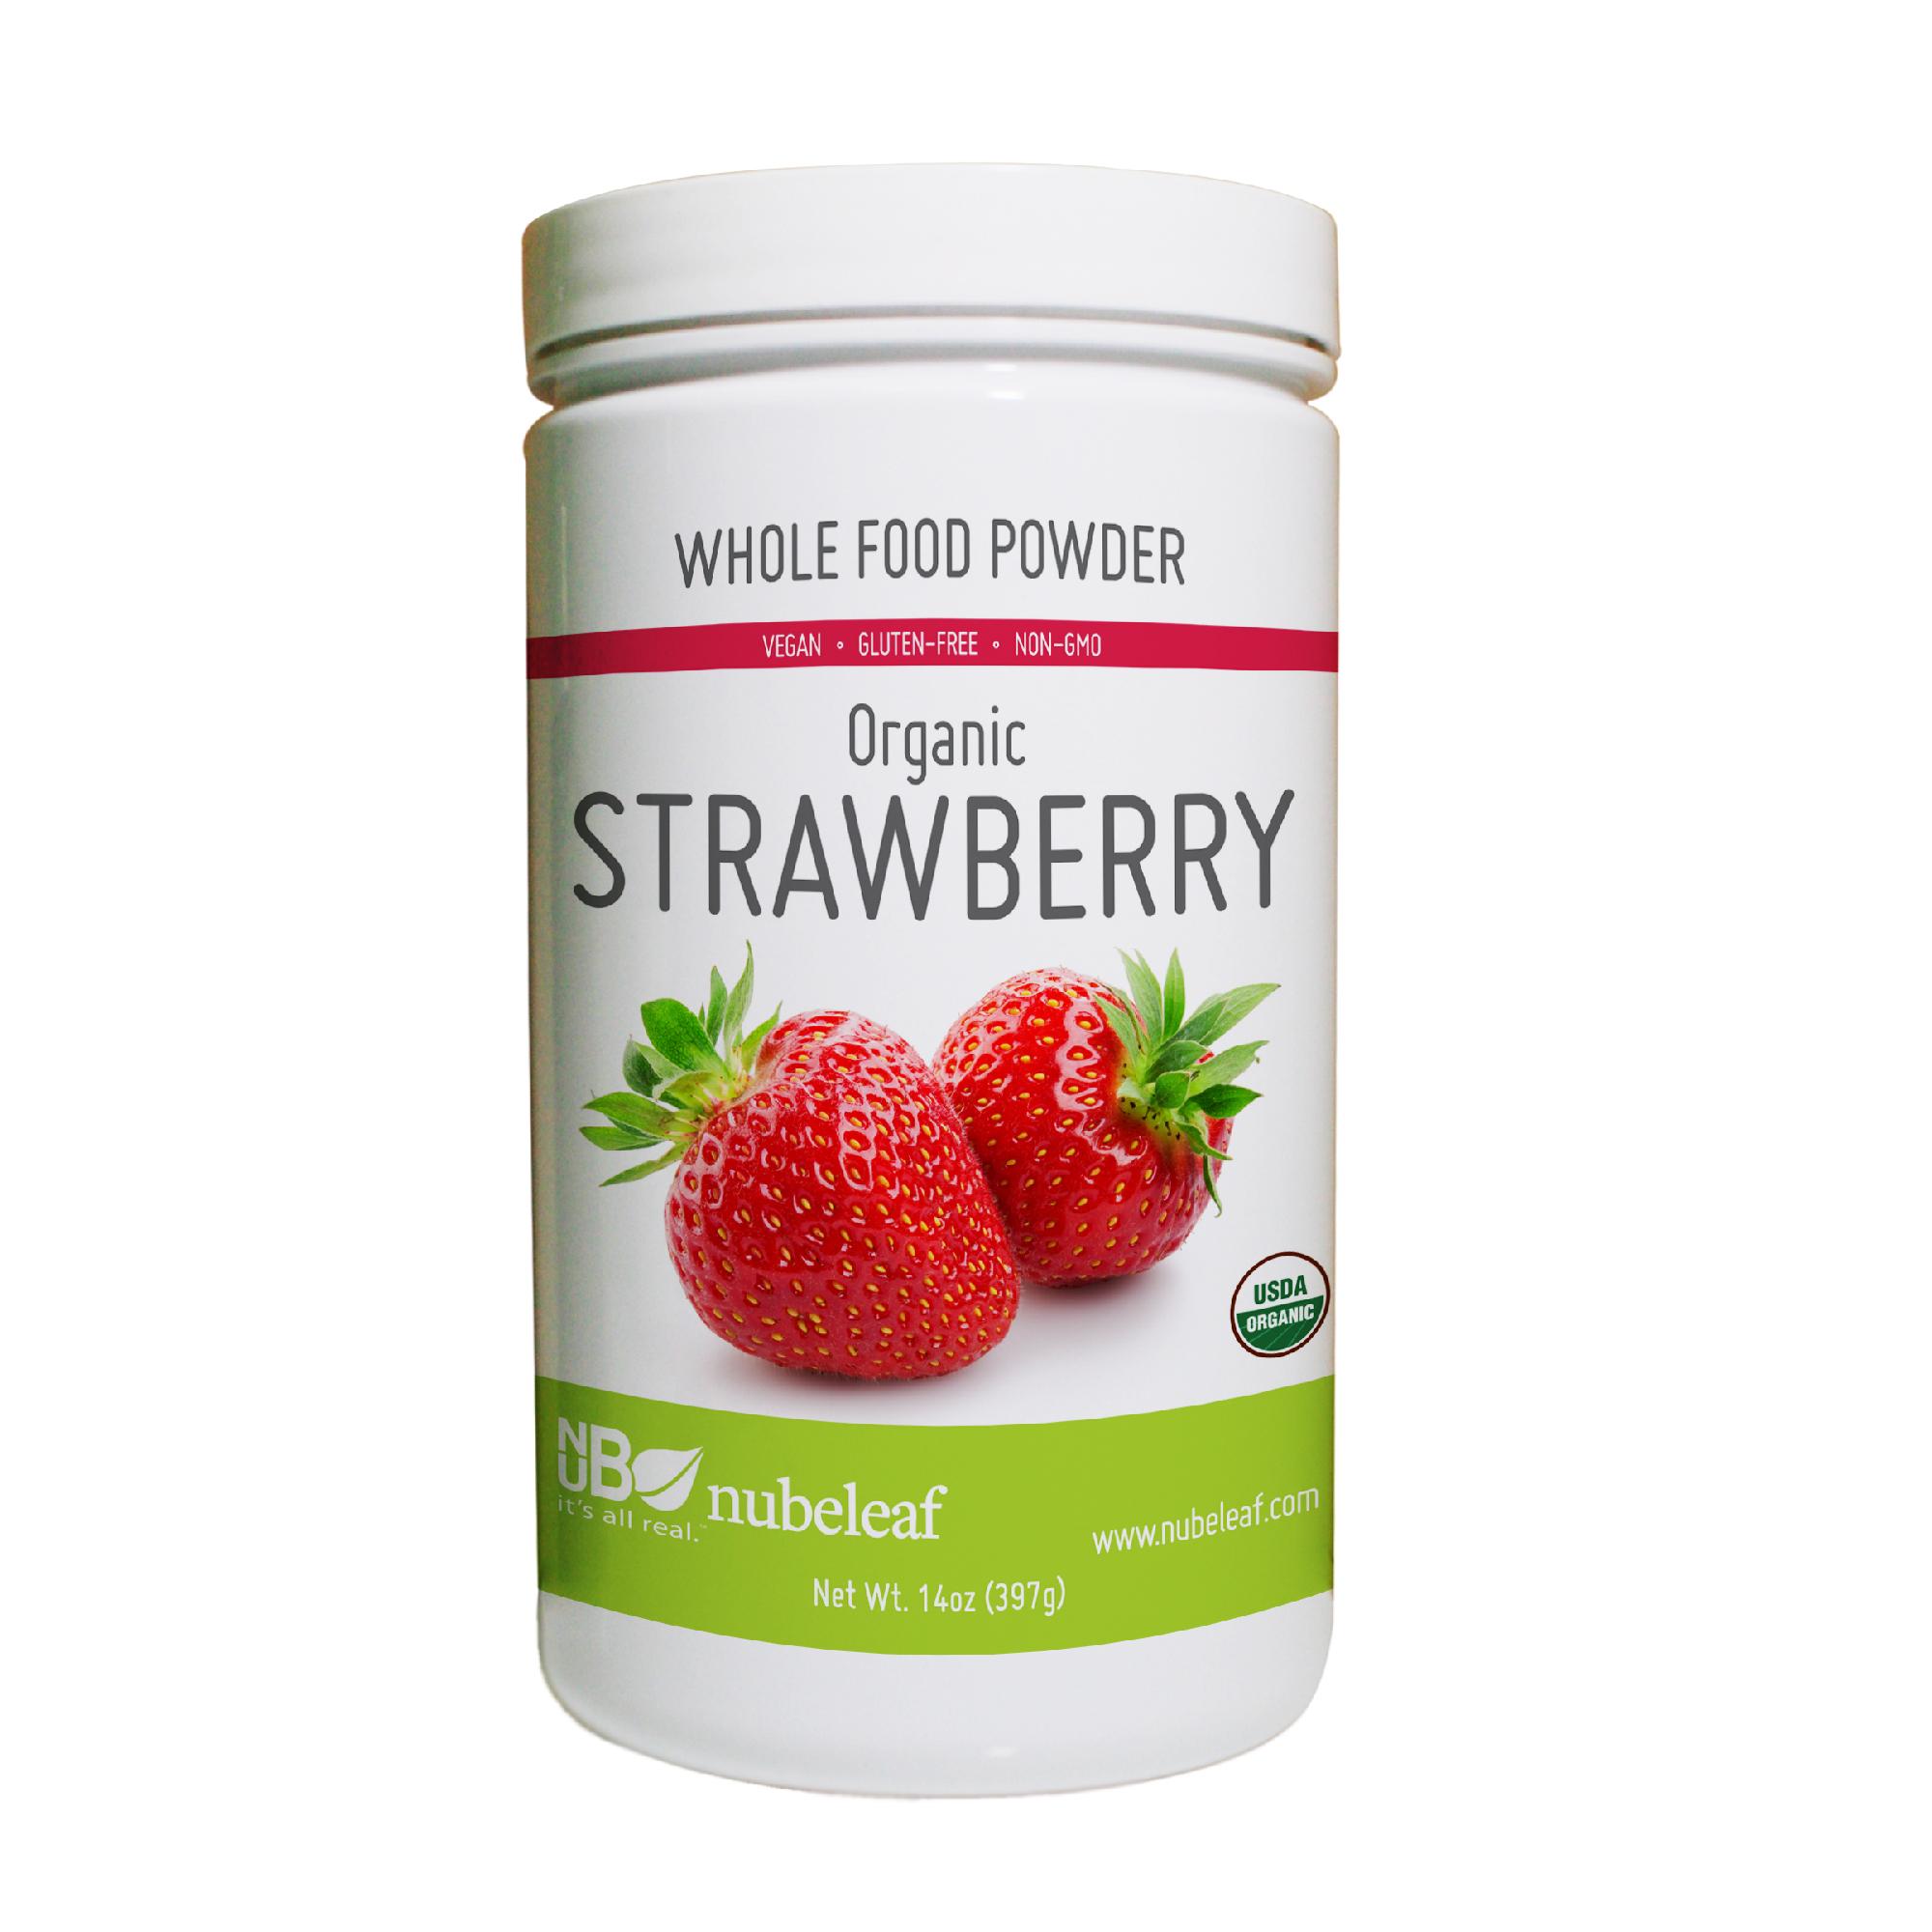 NubeleafStrawberryR1_LRG1.jpg